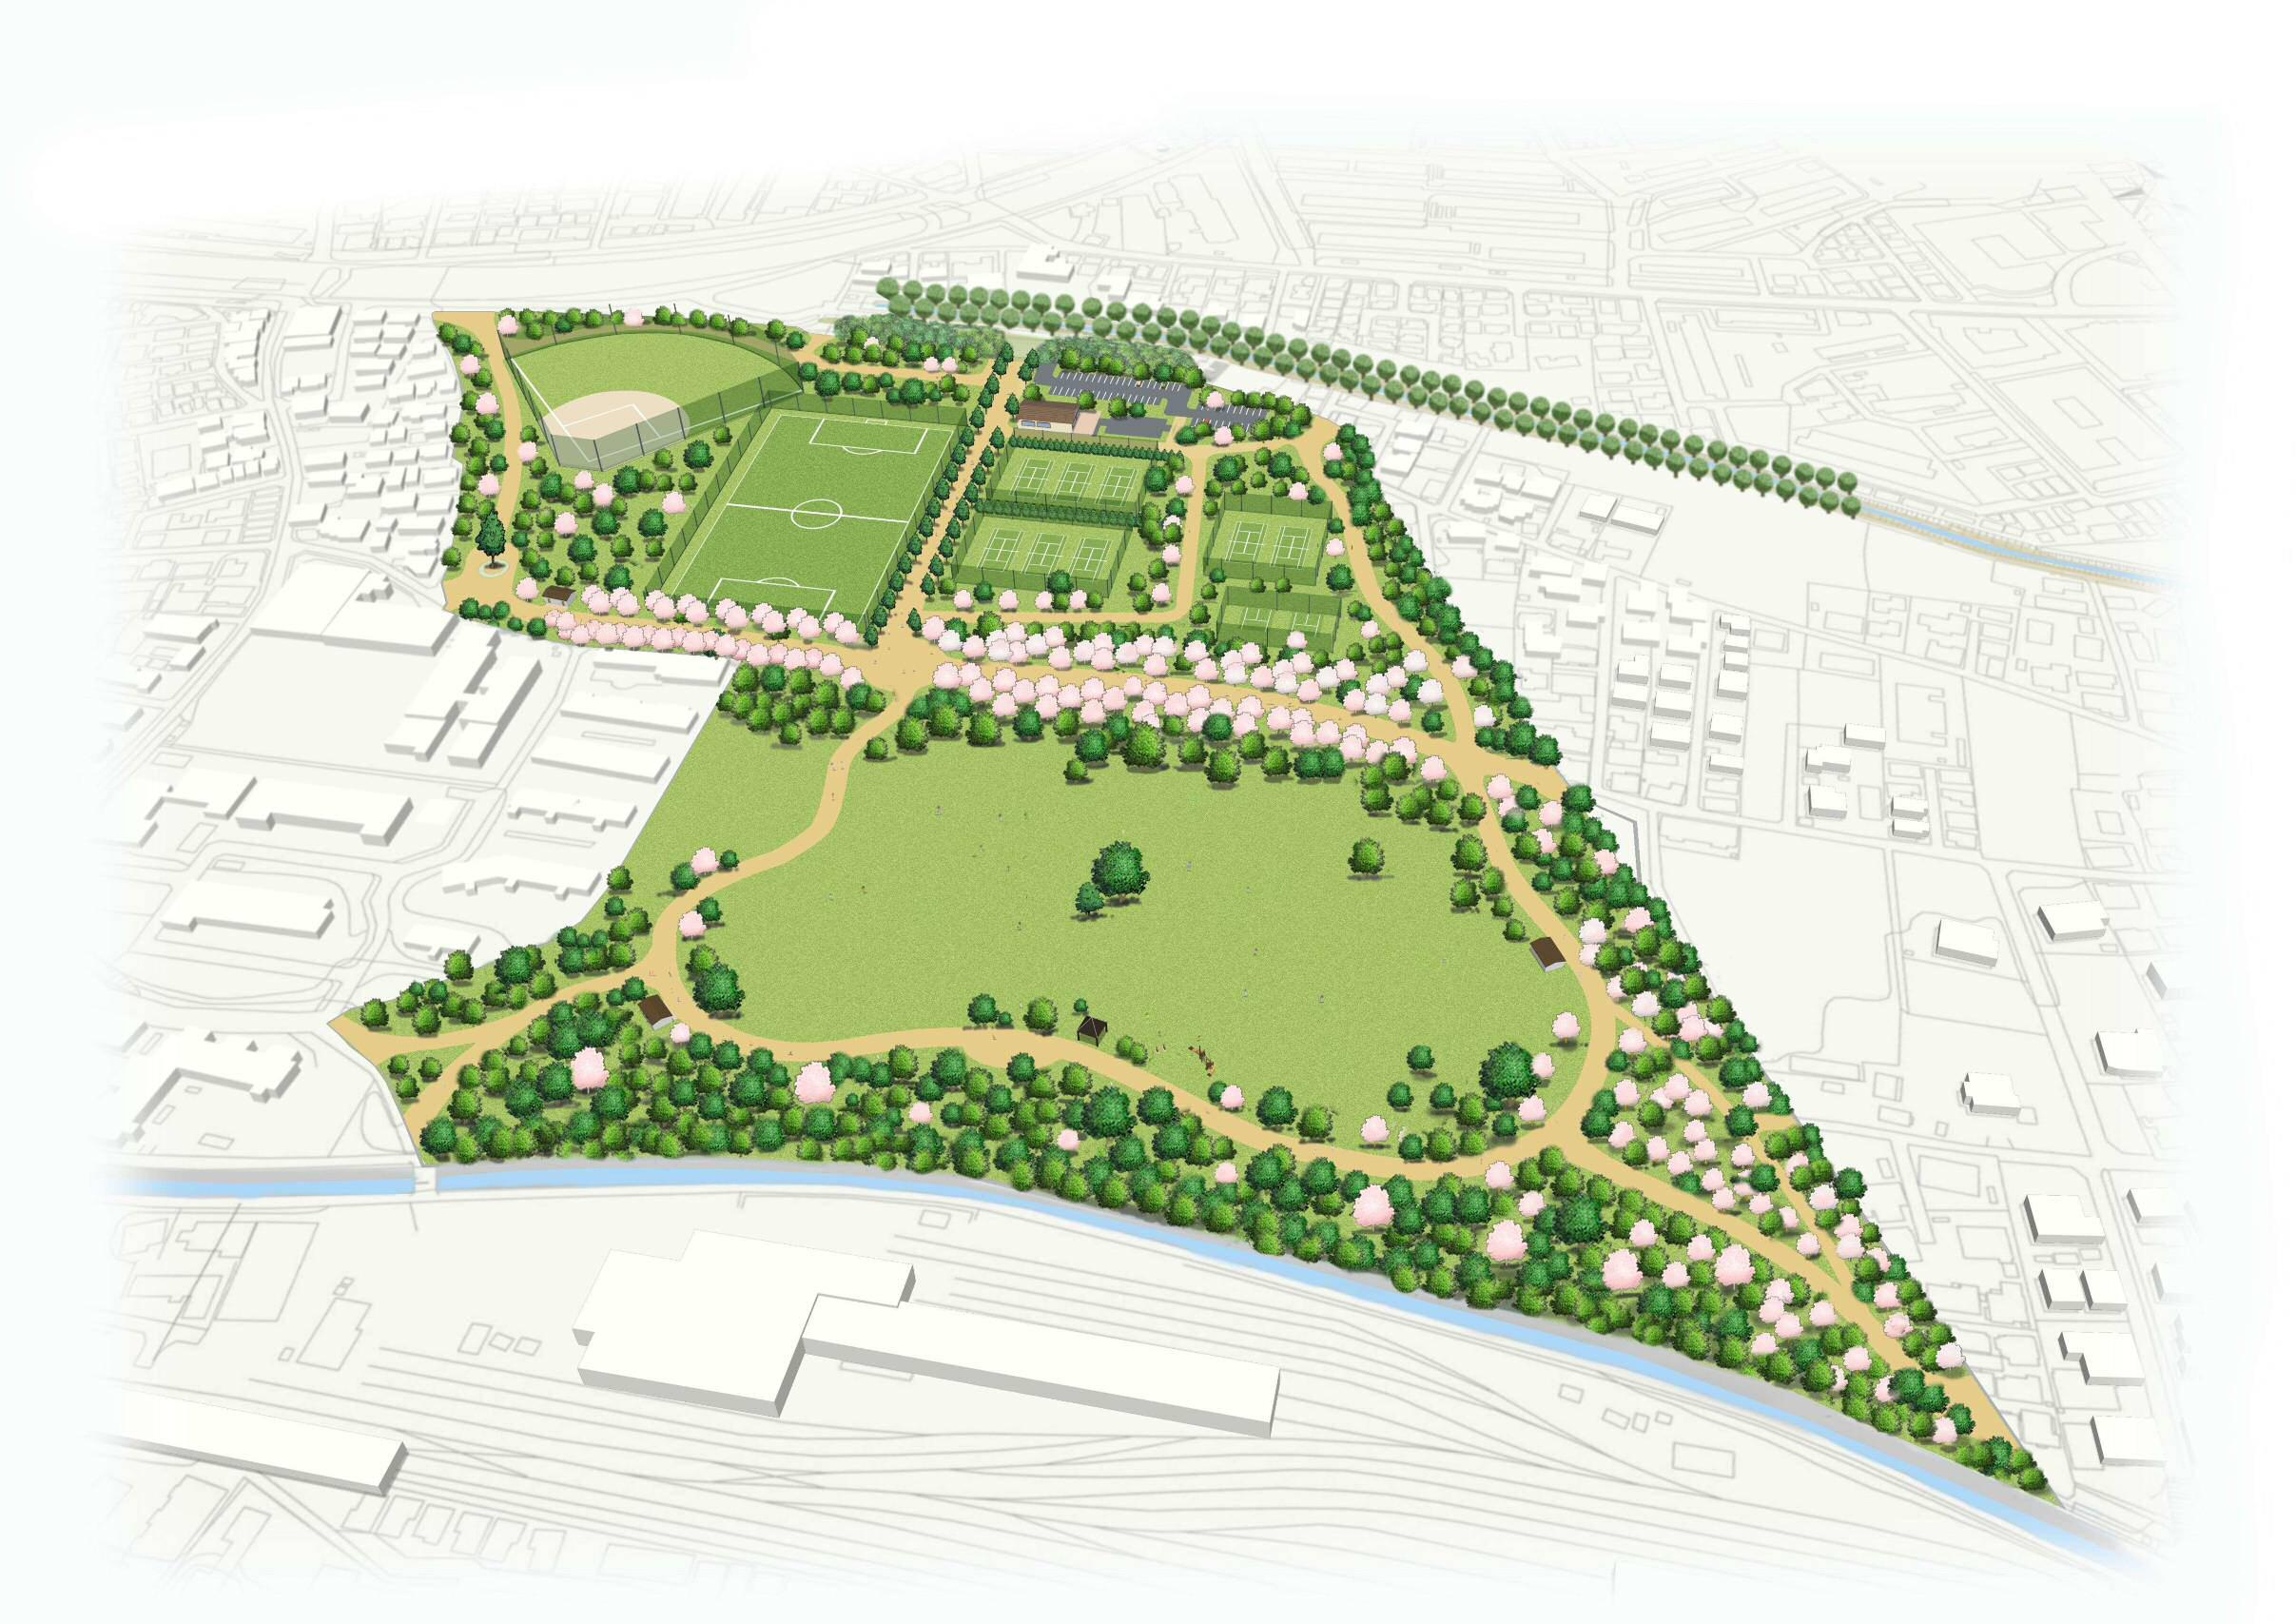 都立高井戸公園整備計画(東京都建設局HPより)